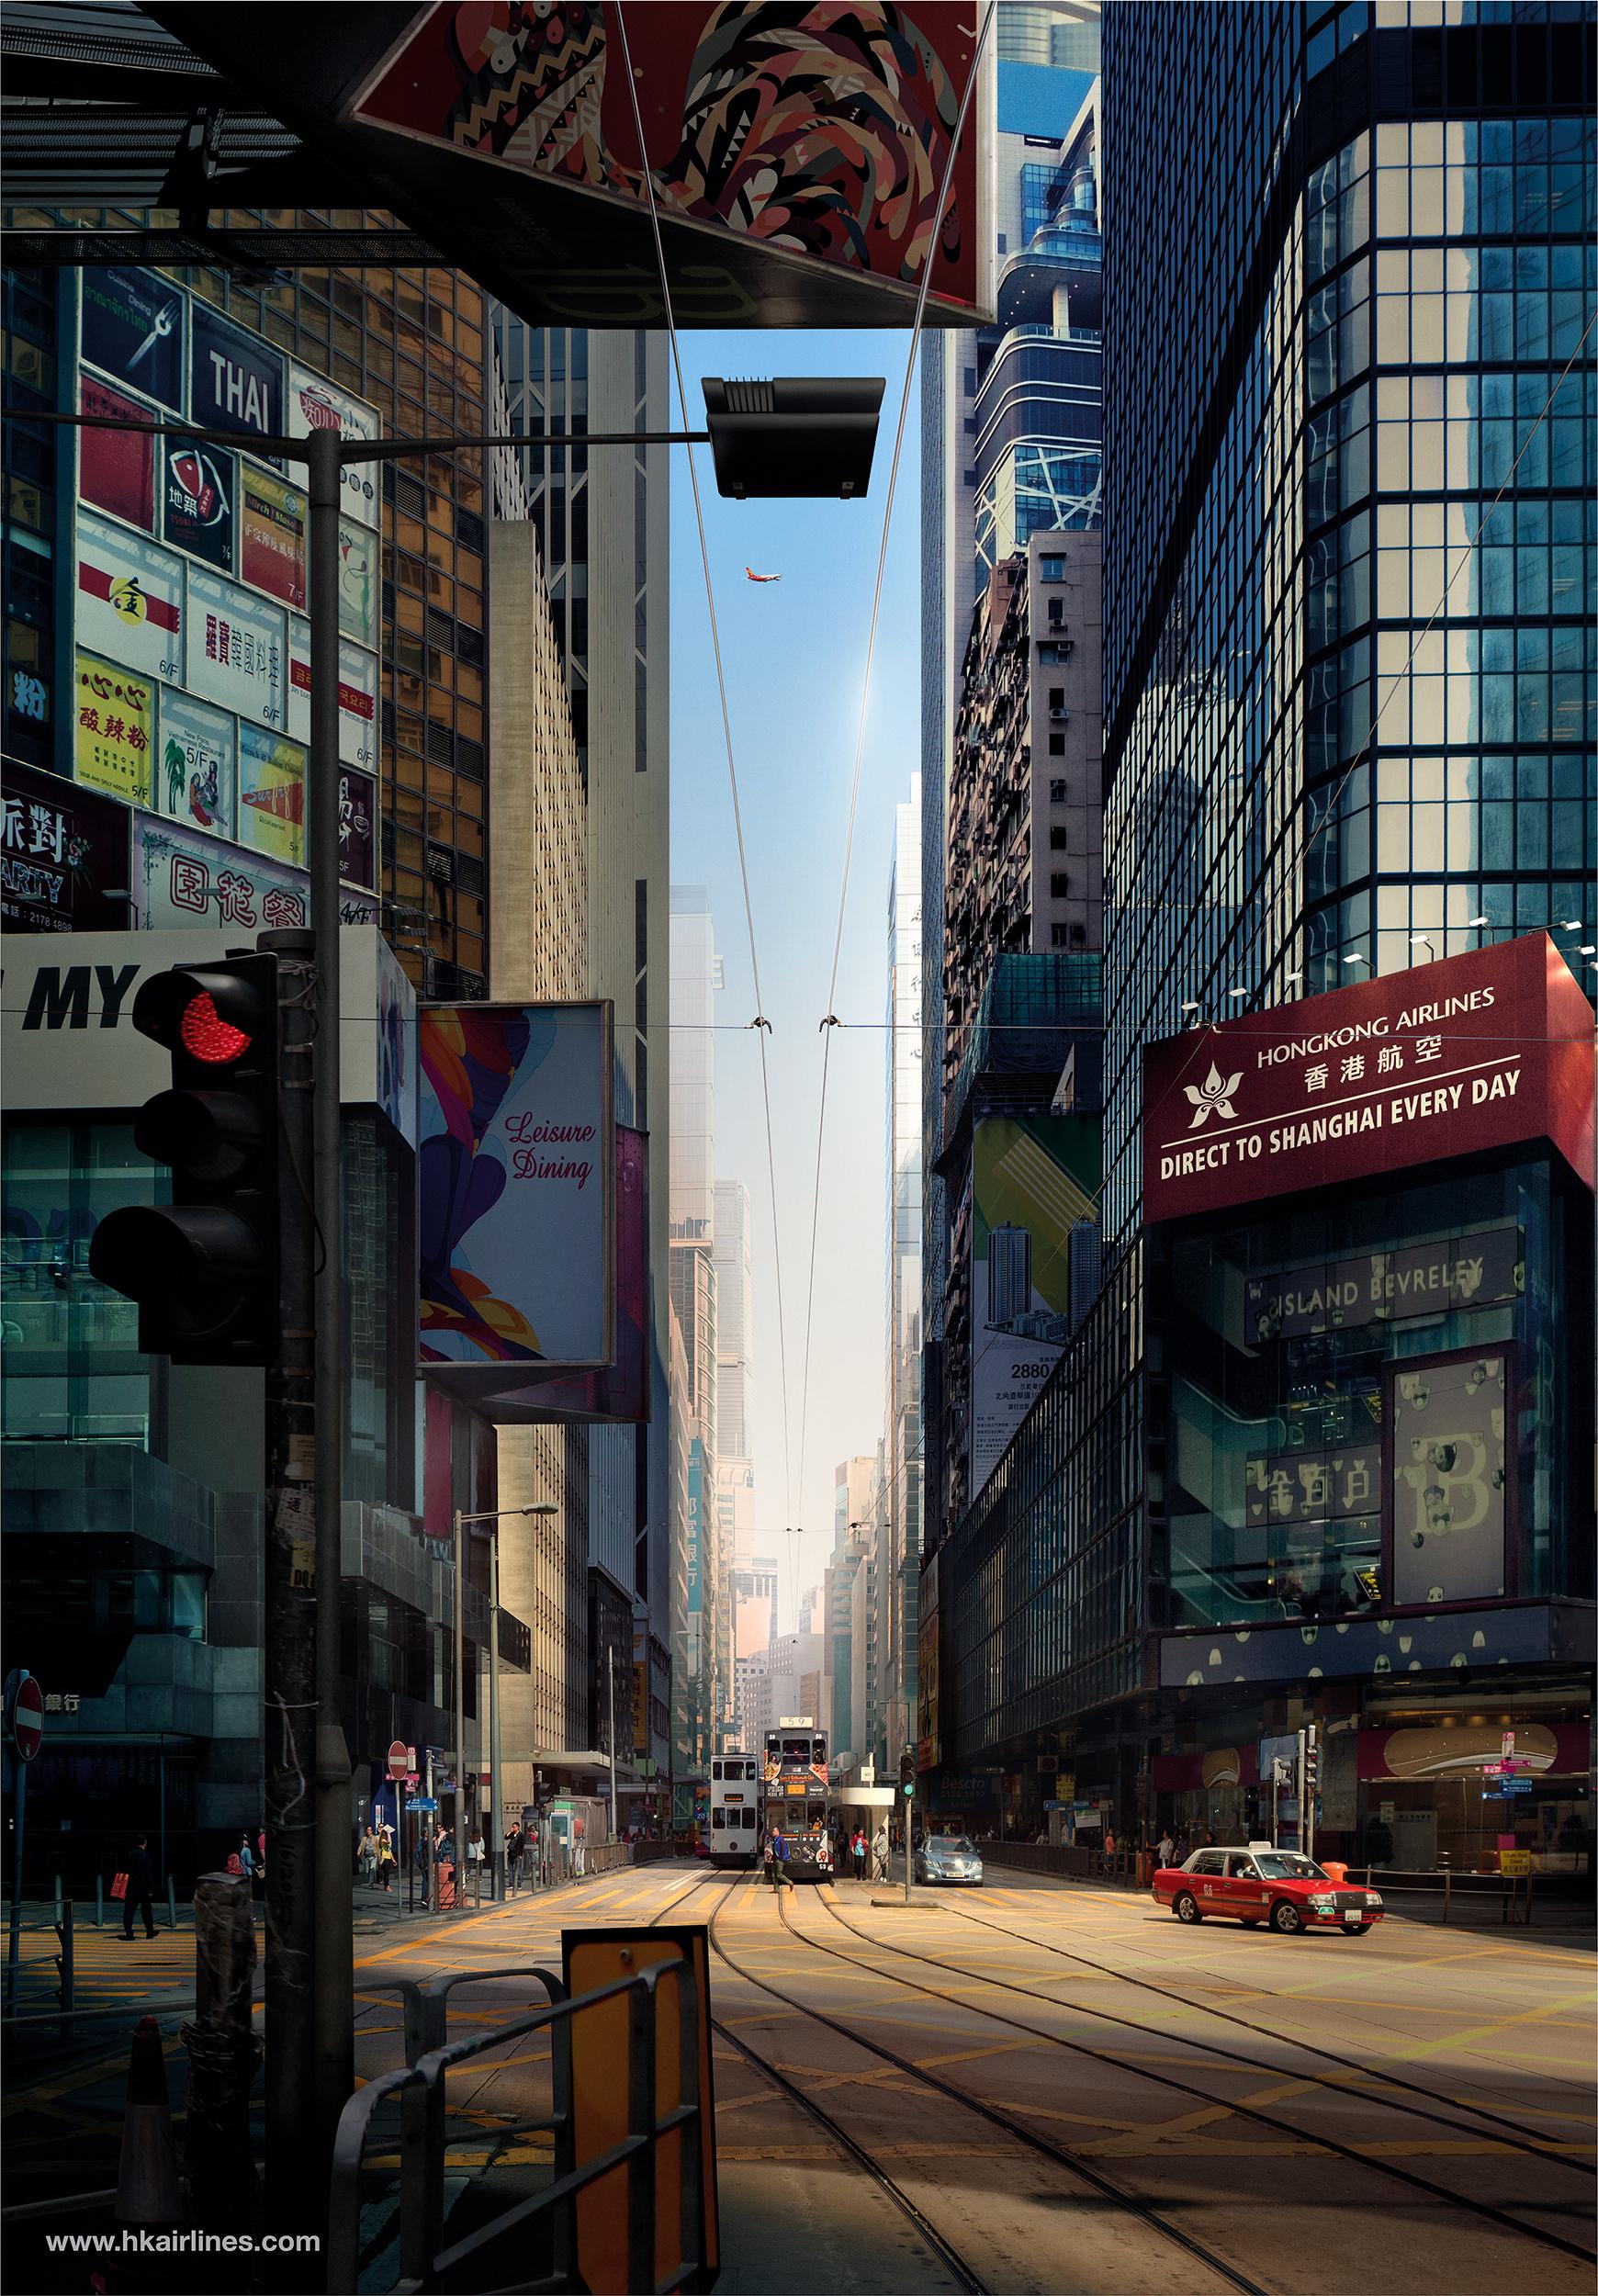 Hong Kong Airlines - Shanghai.jpg